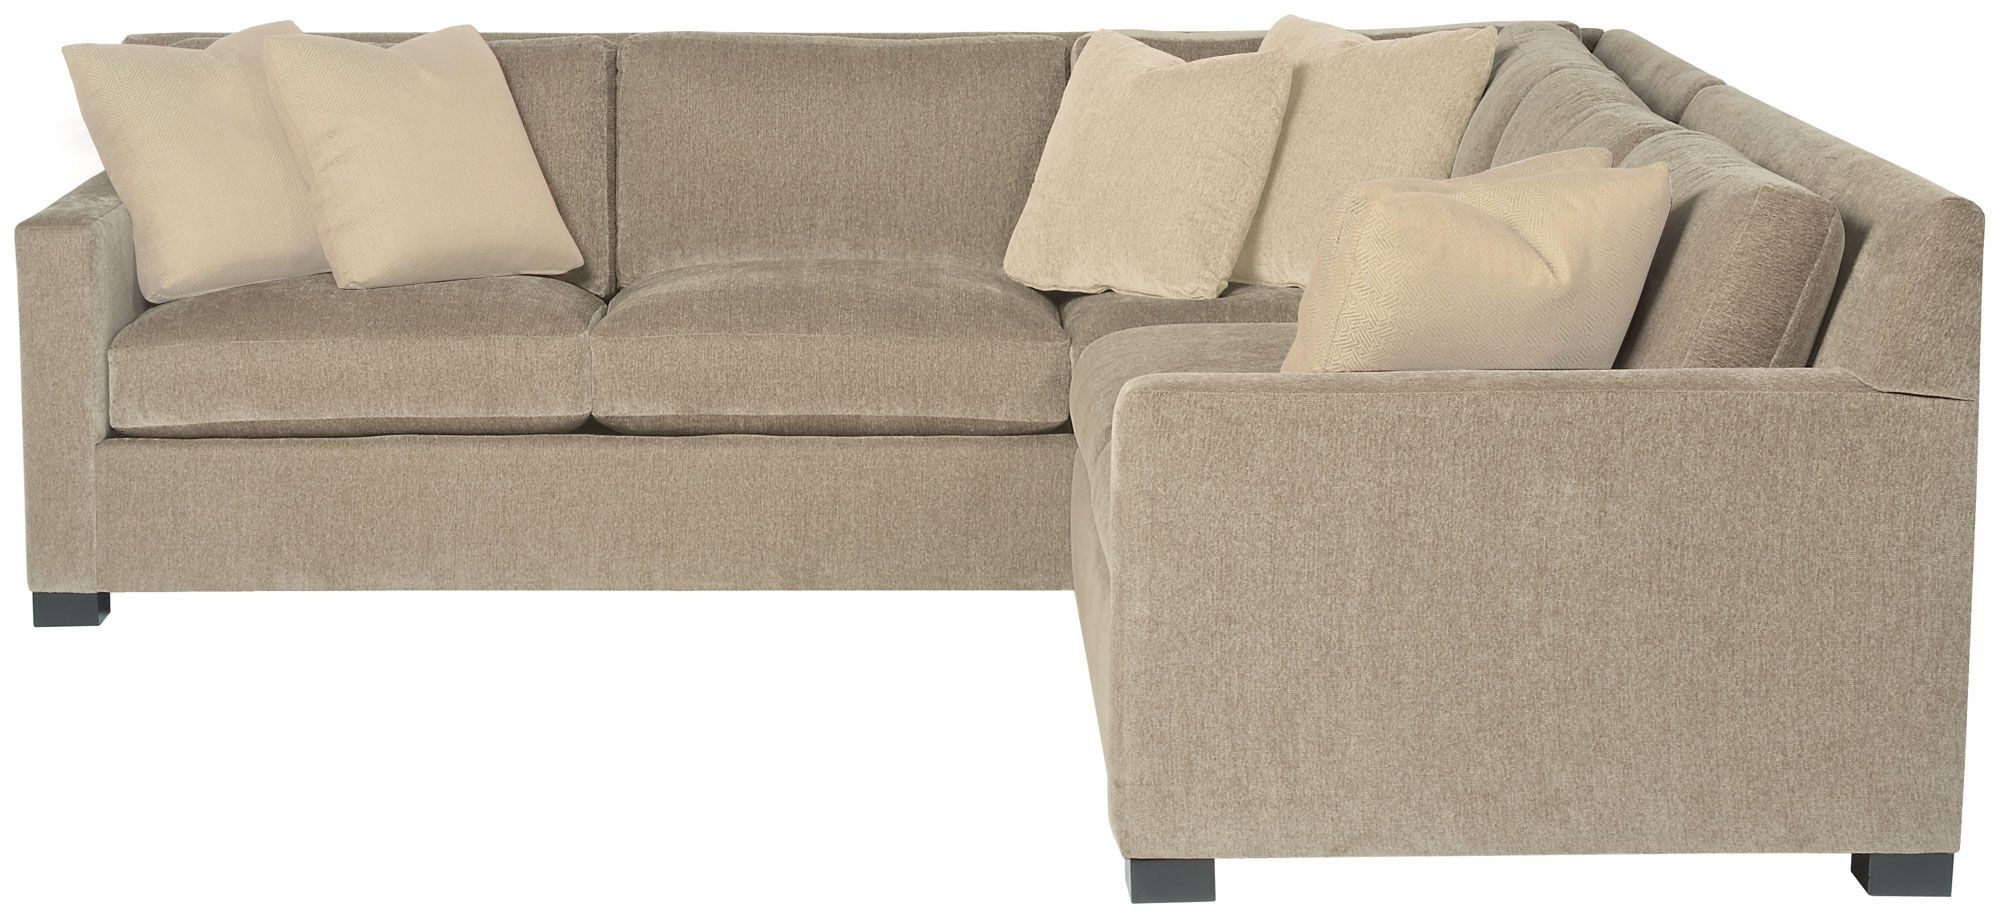 Groovy Sectional 2 Piece Bernhardt Sofa Bernhardt Furniture Home Remodeling Inspirations Basidirectenergyitoicom